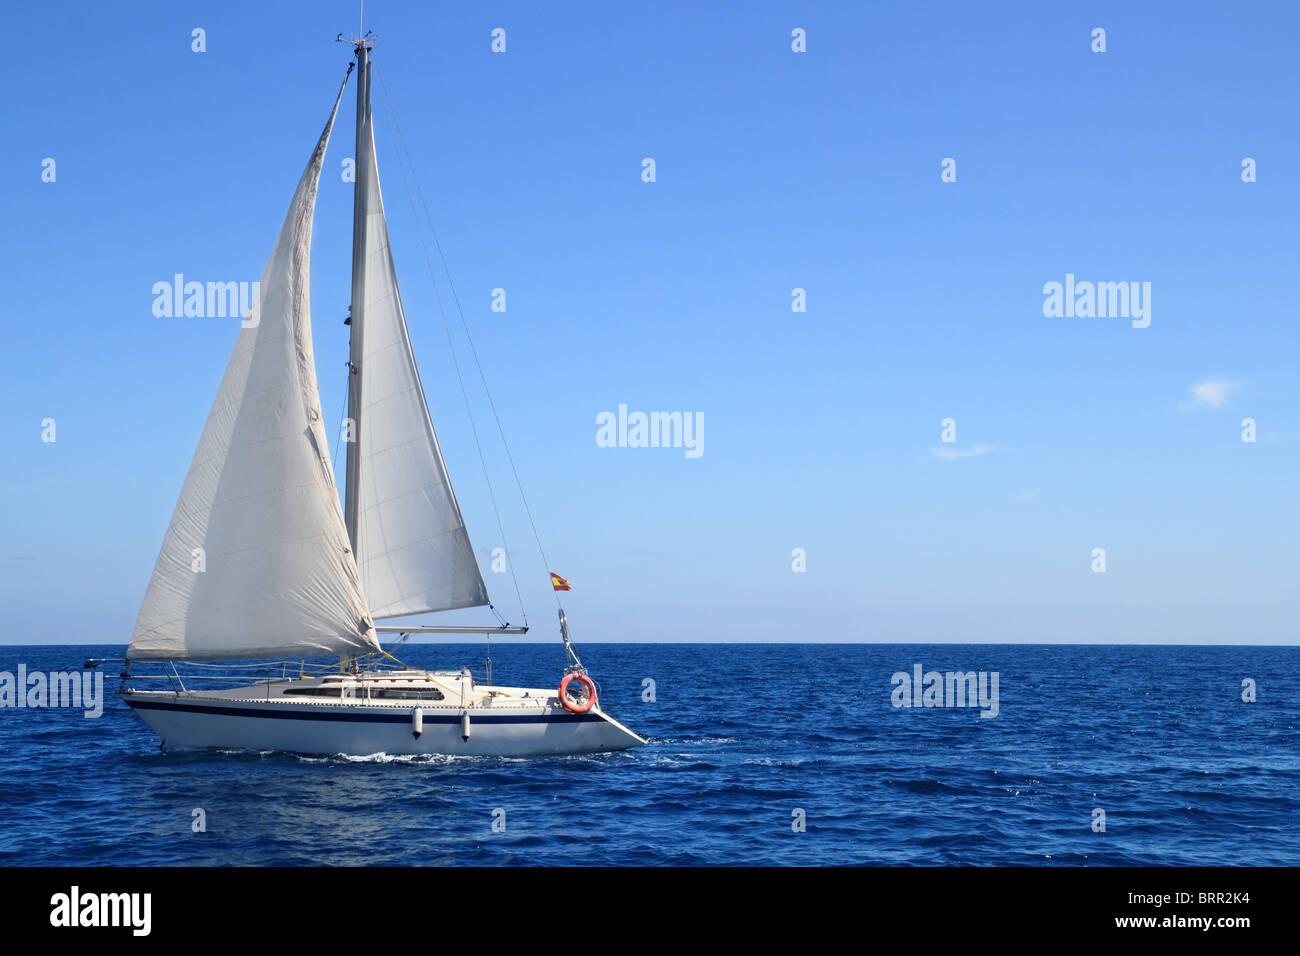 beautiful sailboat sailing sail blue Mediterranean sea ocean horizon - Stock Image